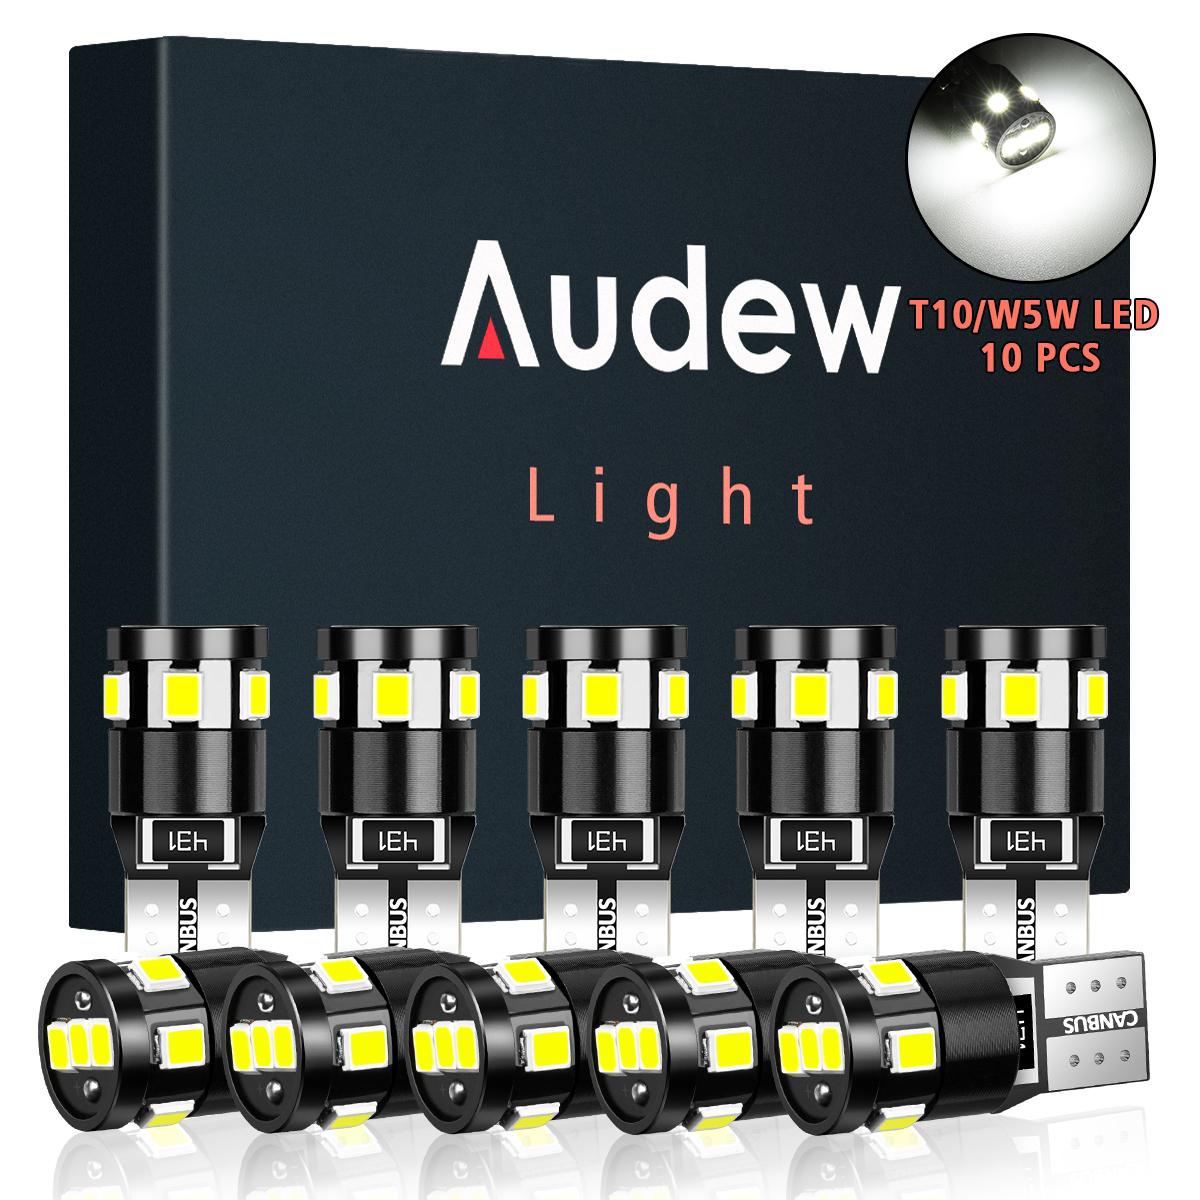 Audew t10 w5w car 2835 smd led side marker lights parking interior bulbs canbus error free 2.7w 4882k xenon white 10pcs Sale - Banggood.com ...